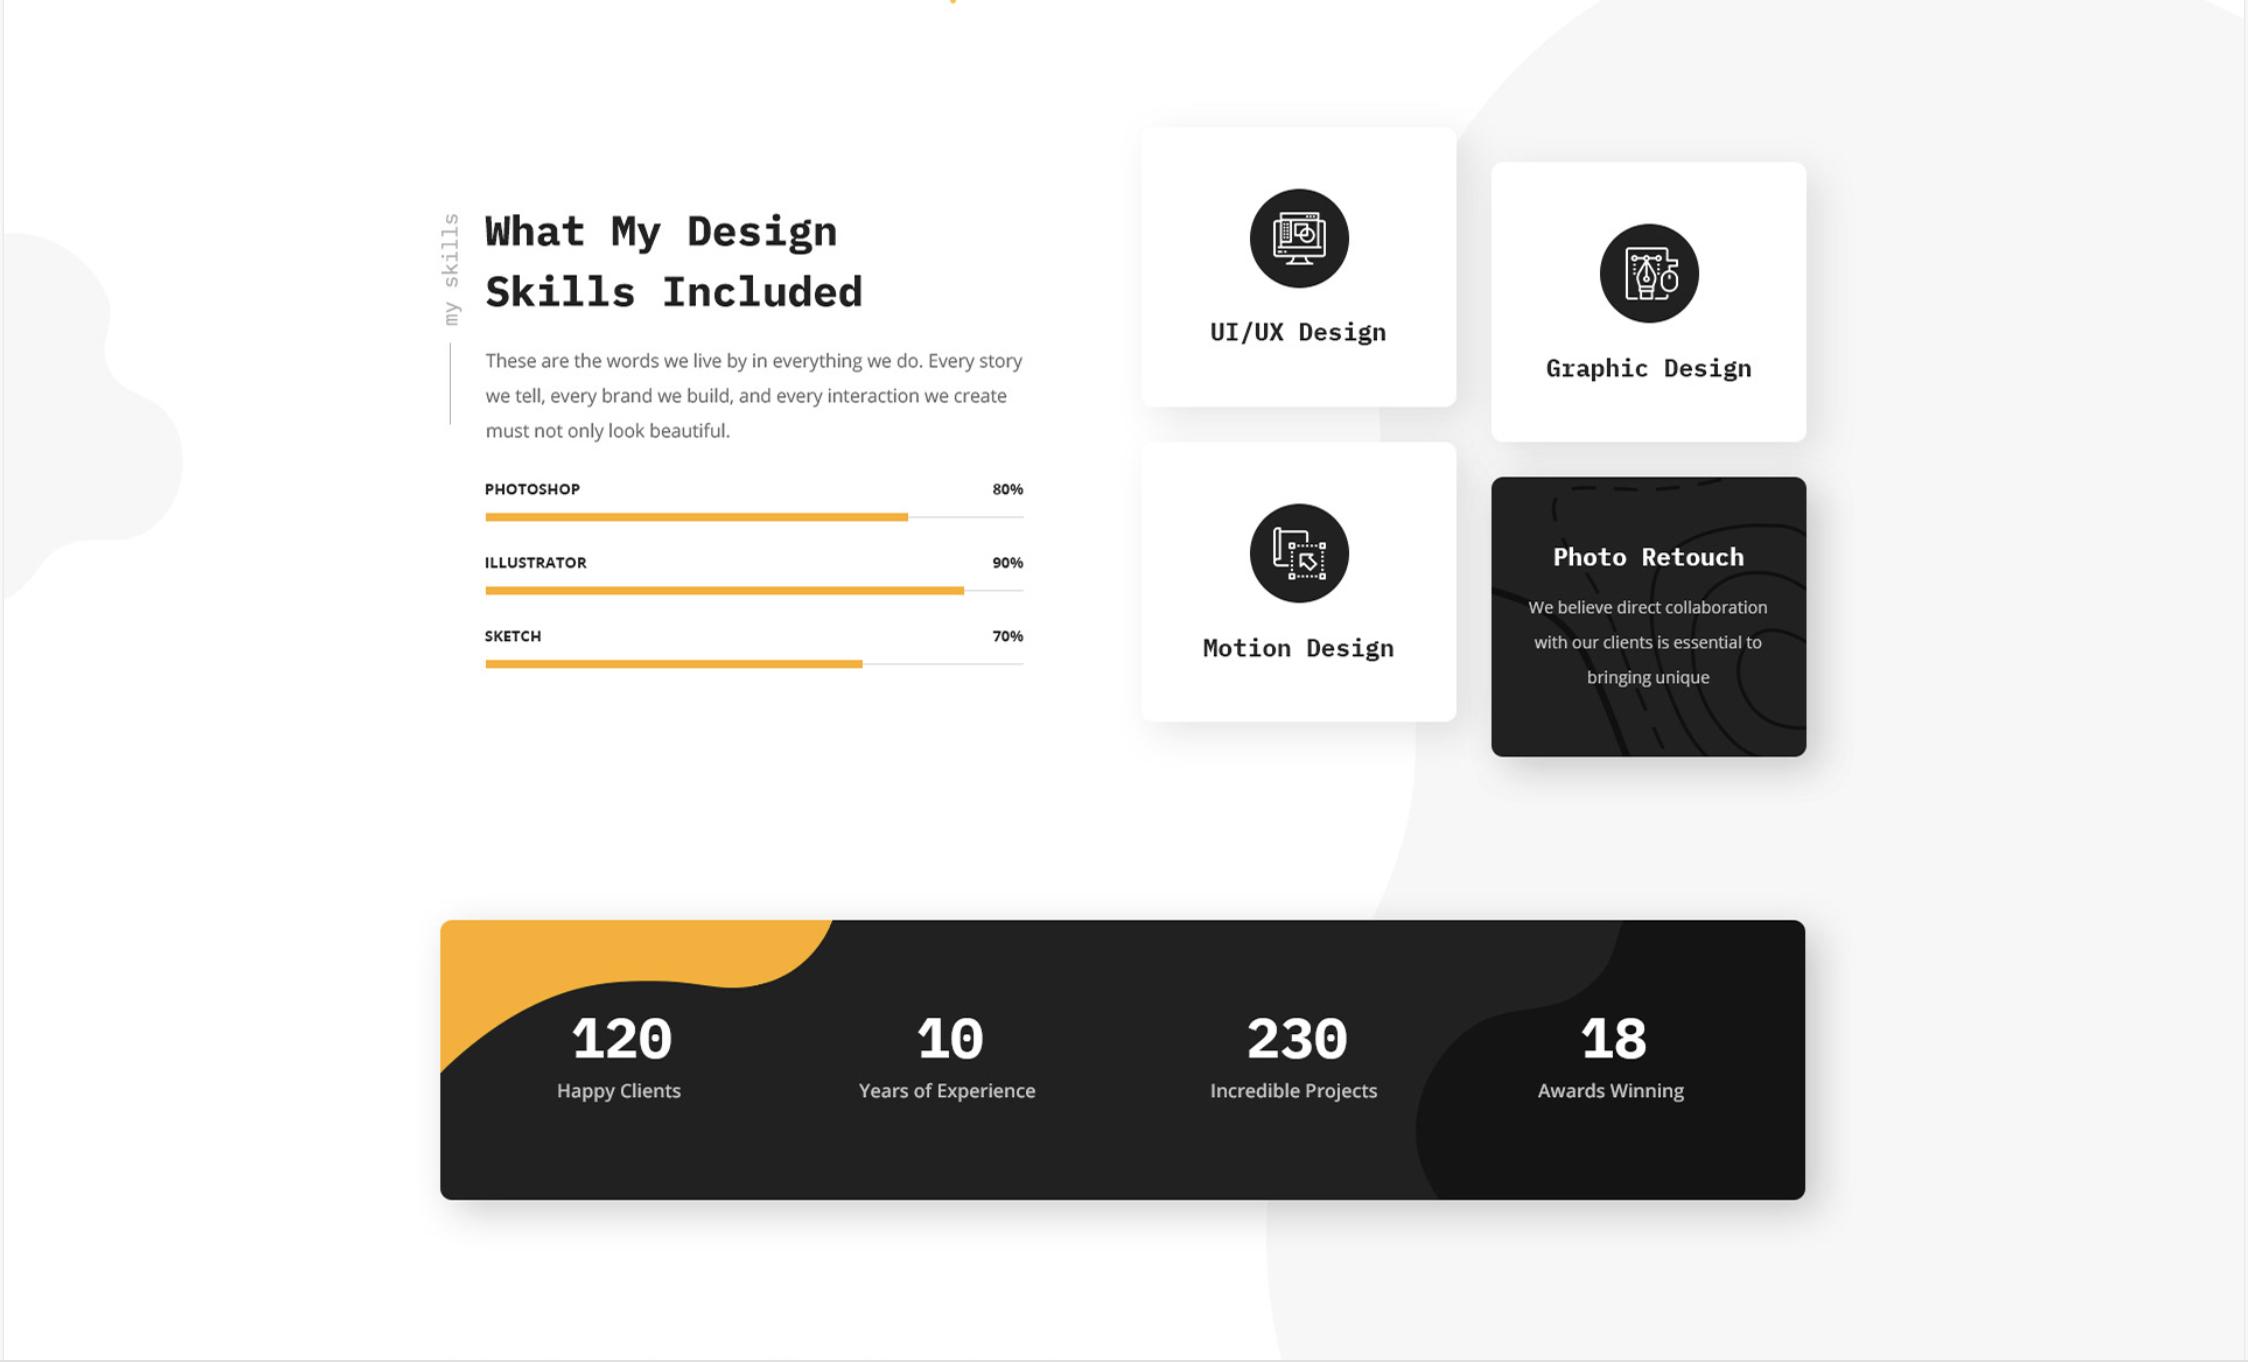 design_shot_3